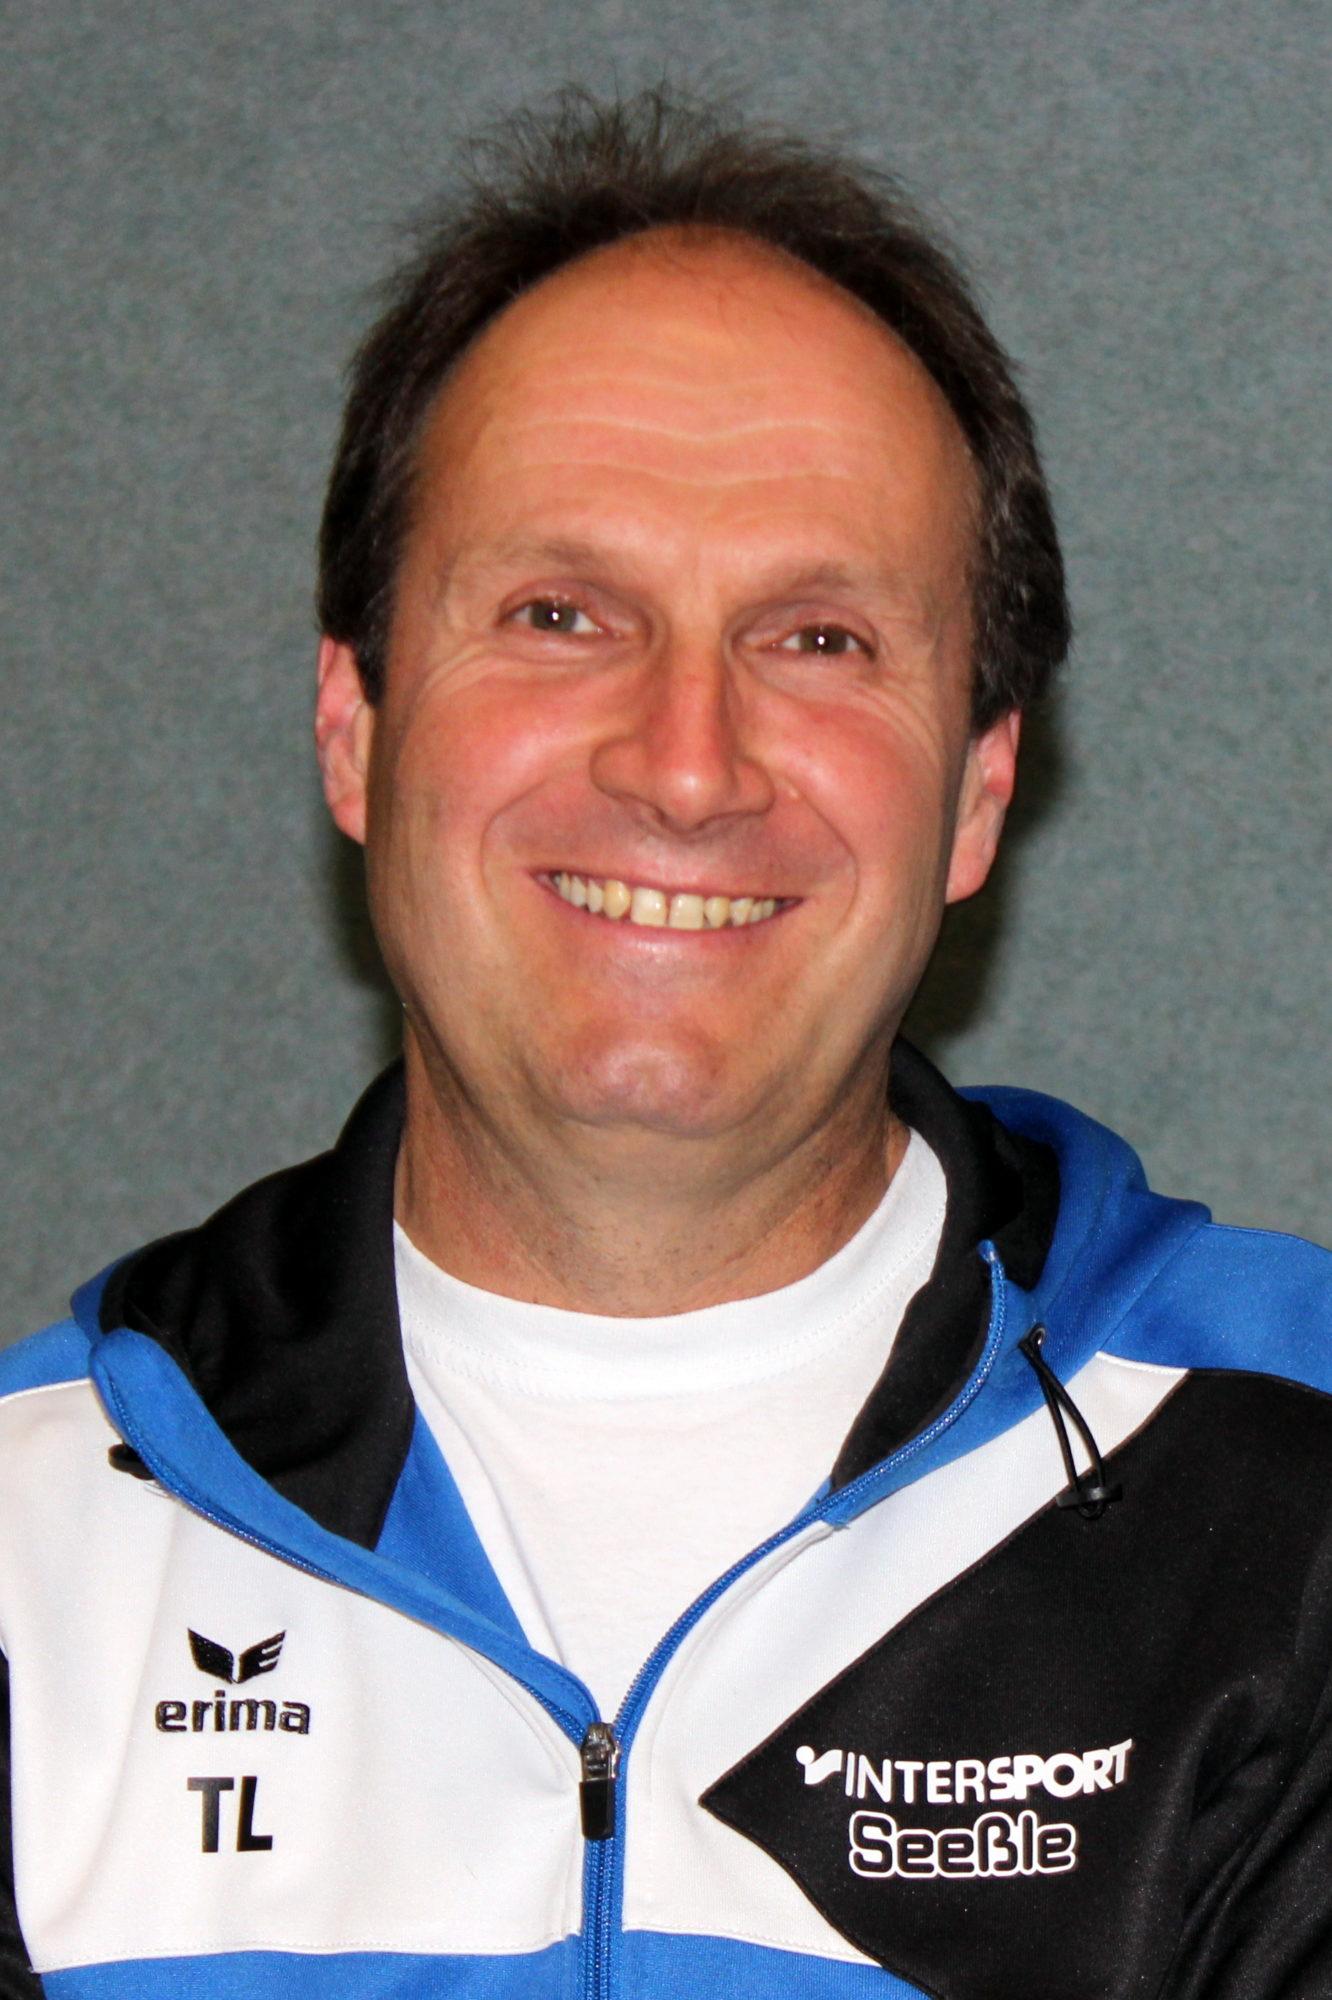 Thomas Leidig